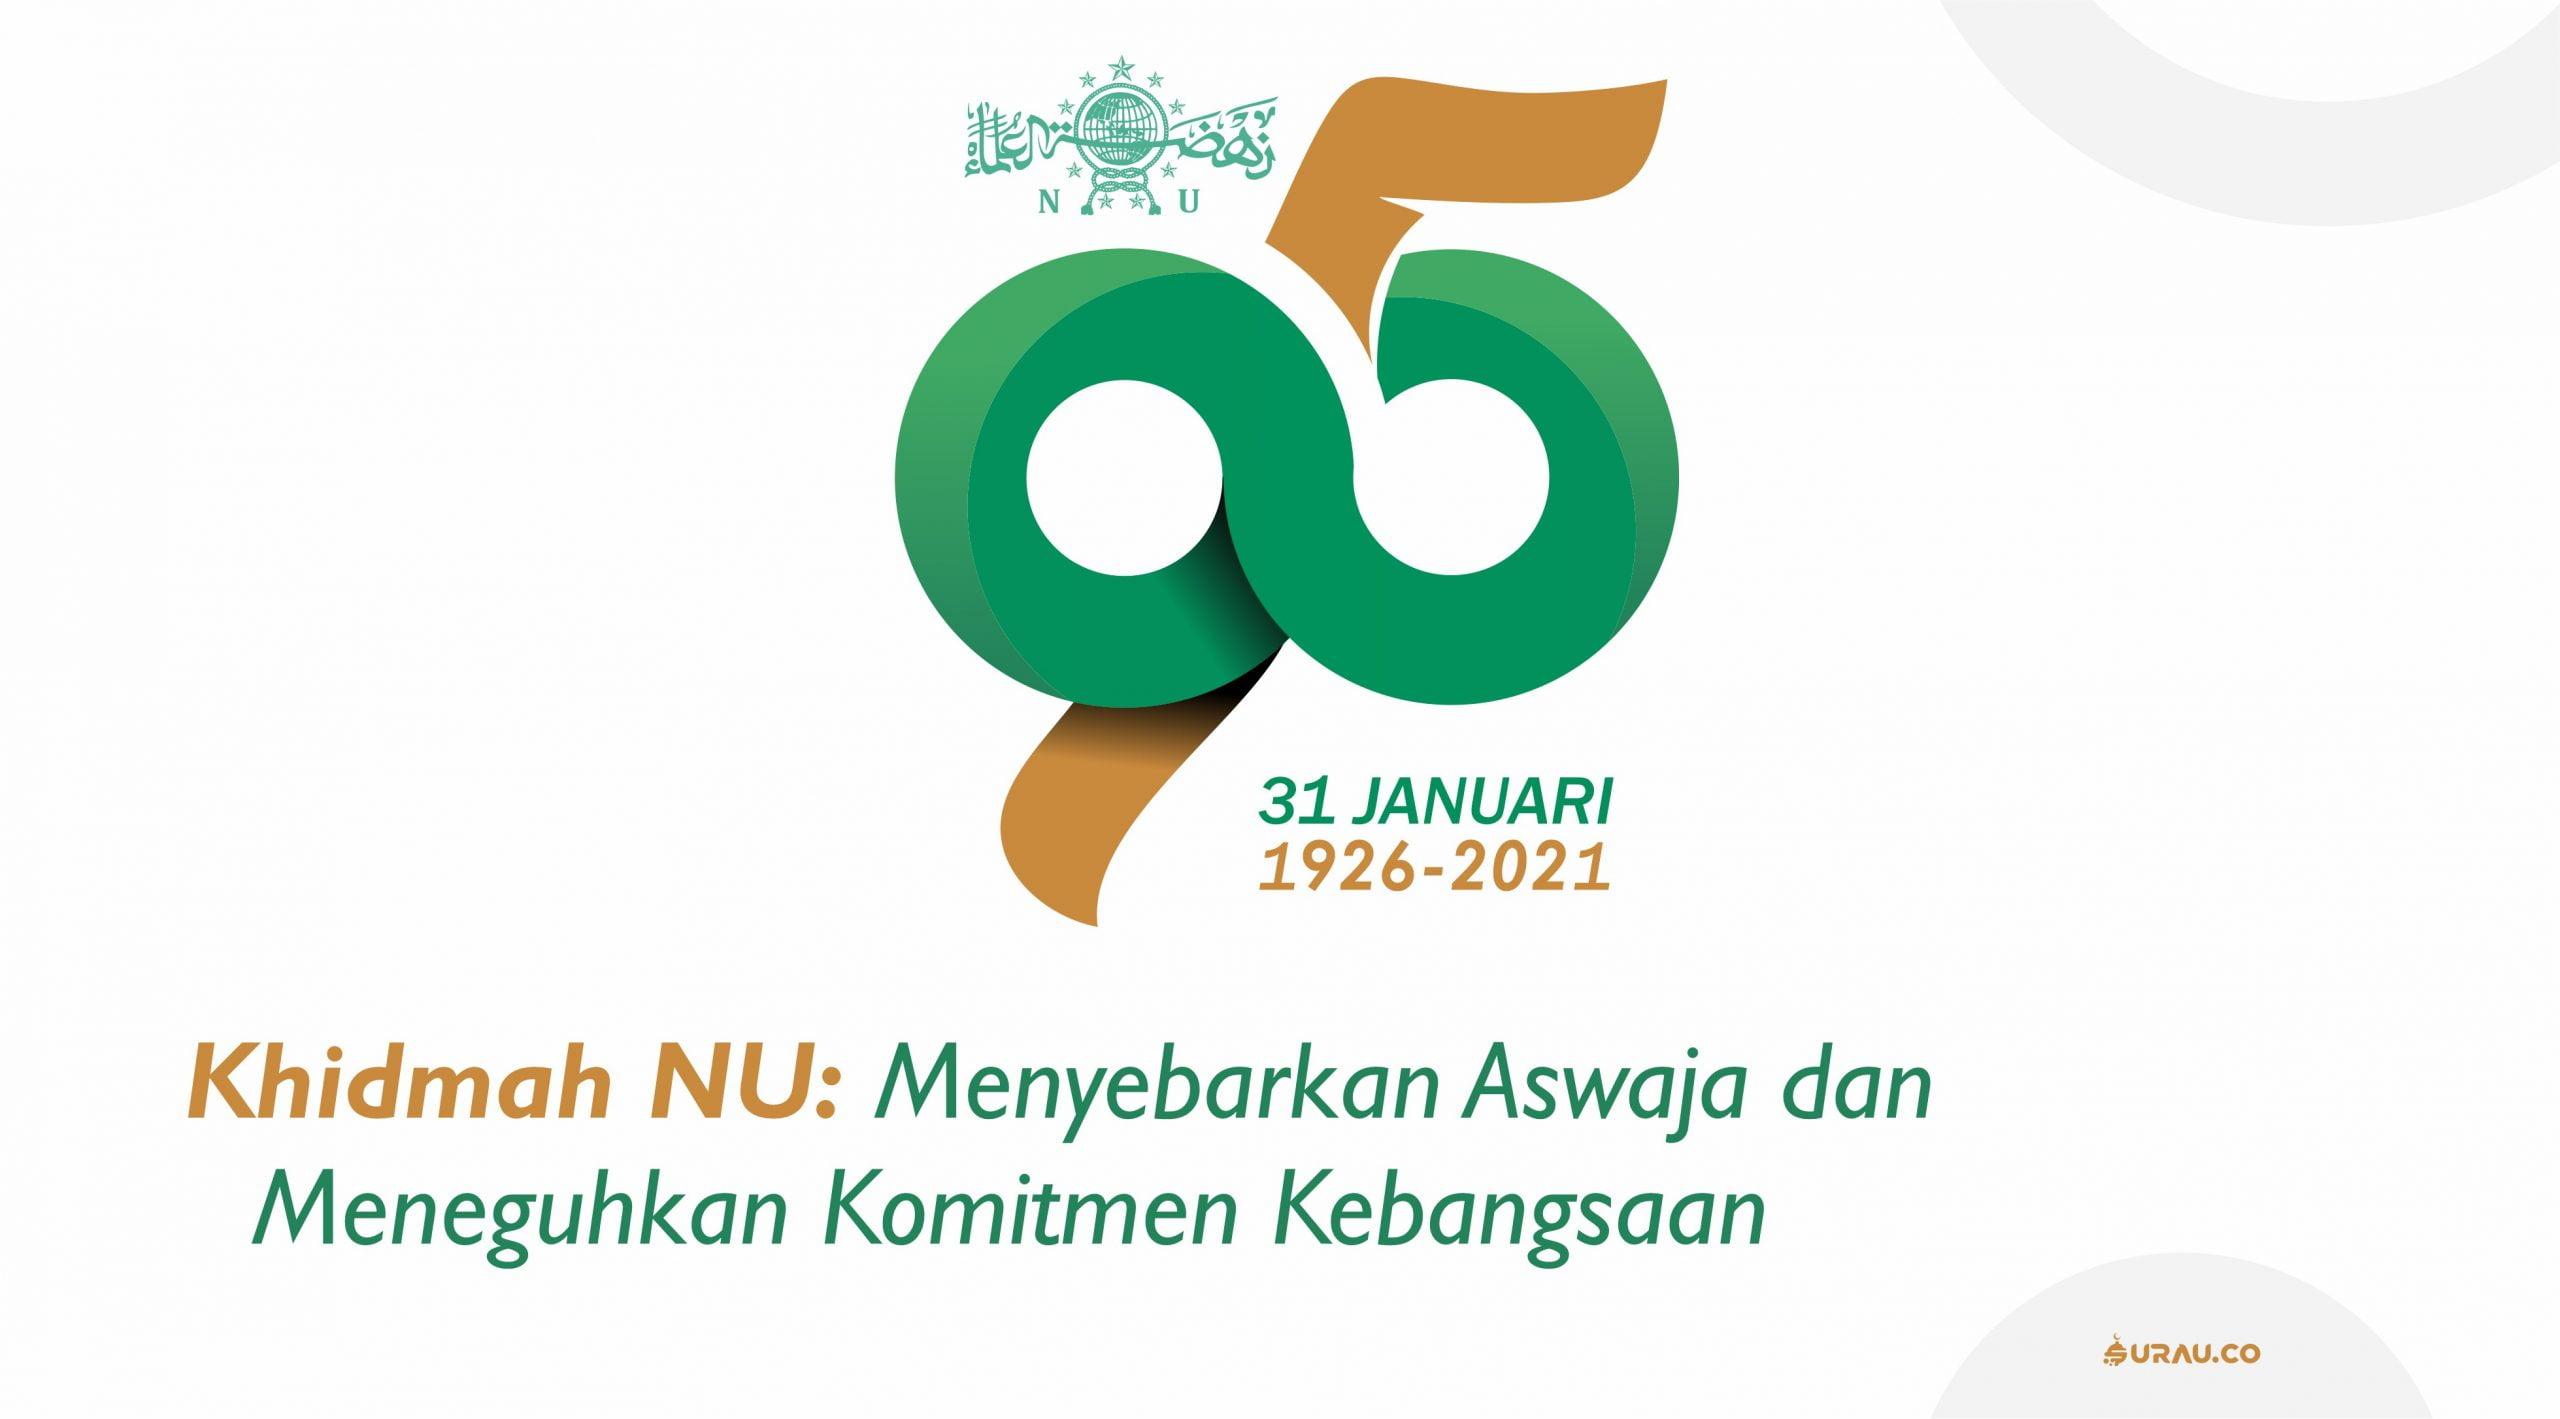 Logo Harlah NU By: Dian Nur Rafita Ardani Rahmansyah